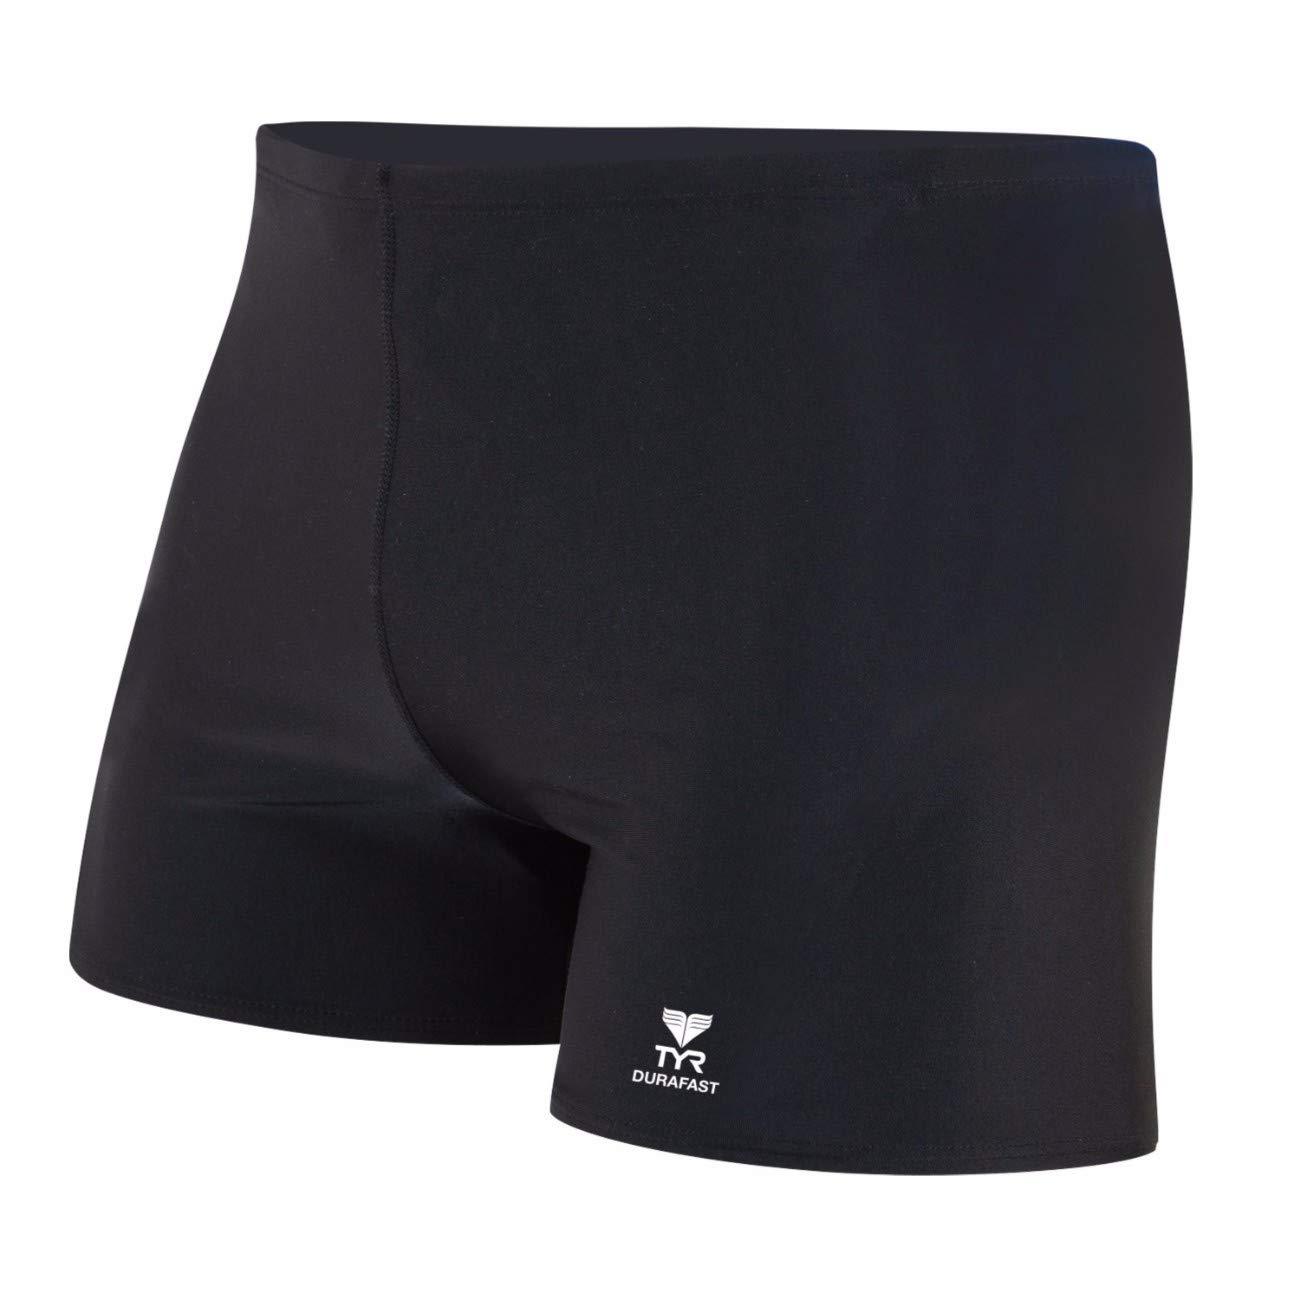 TYR Men's Durafast Elite Solid Square Leg Swimsuit